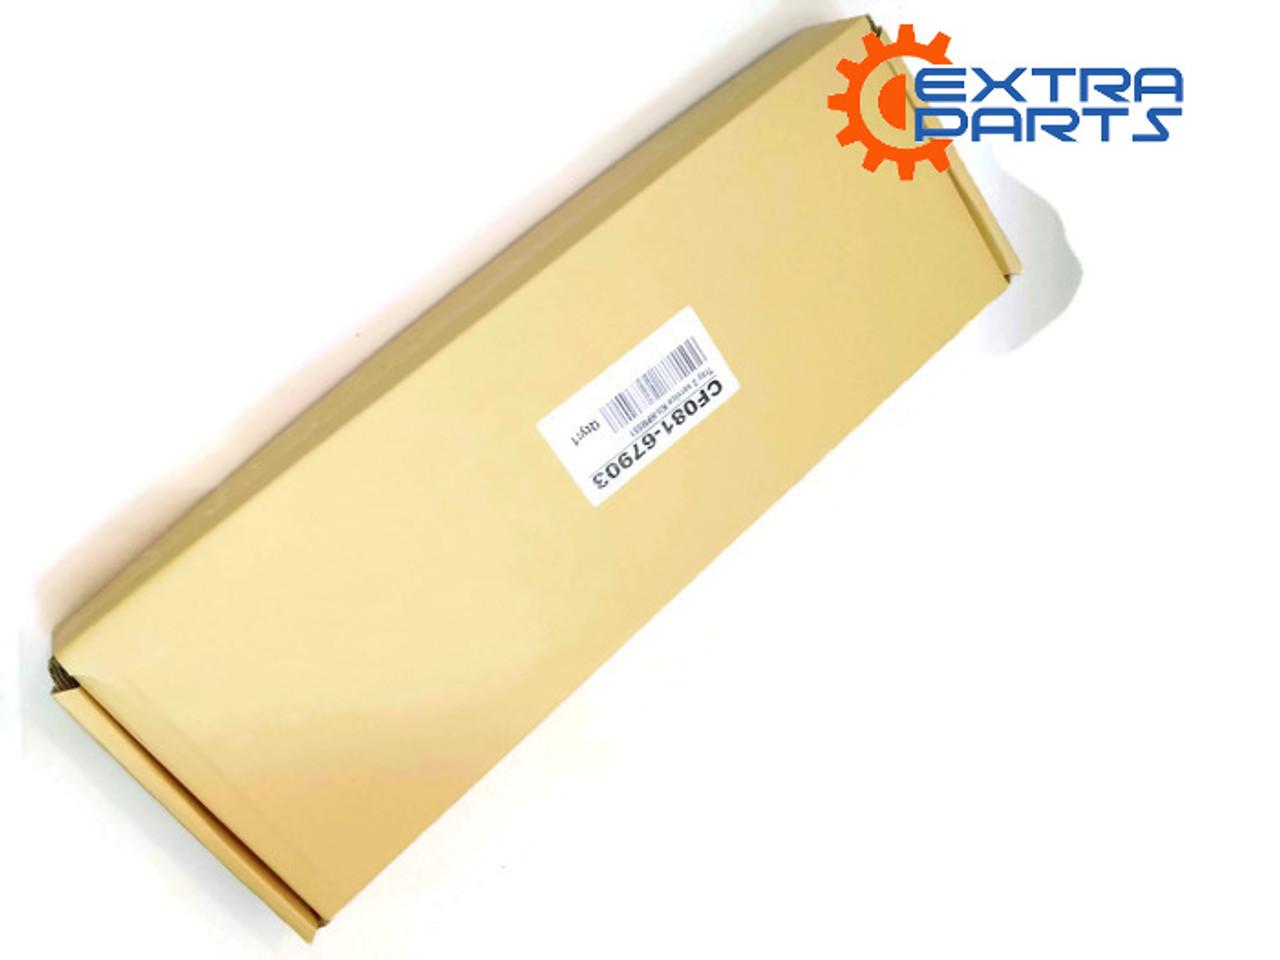 CF081-67903 Tray 2 Service Kit for HP LaserJet Enterprise 500 Color M551